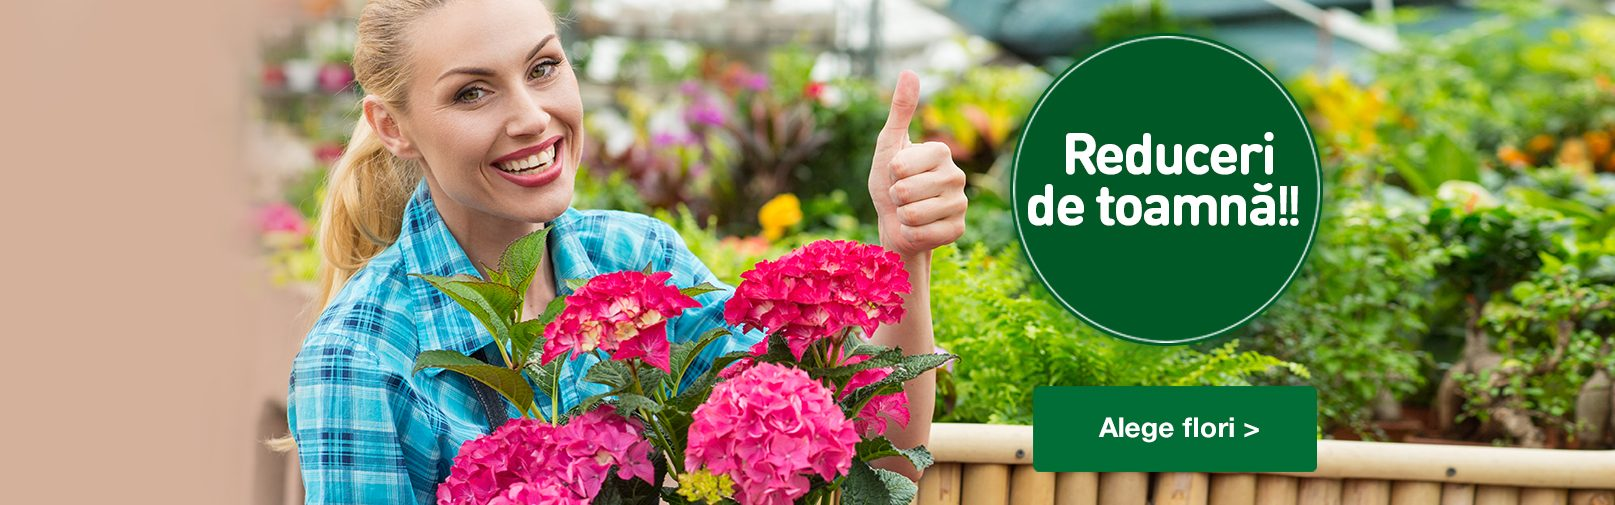 Floraria Trias reduceri toamna banner_site_1905x505